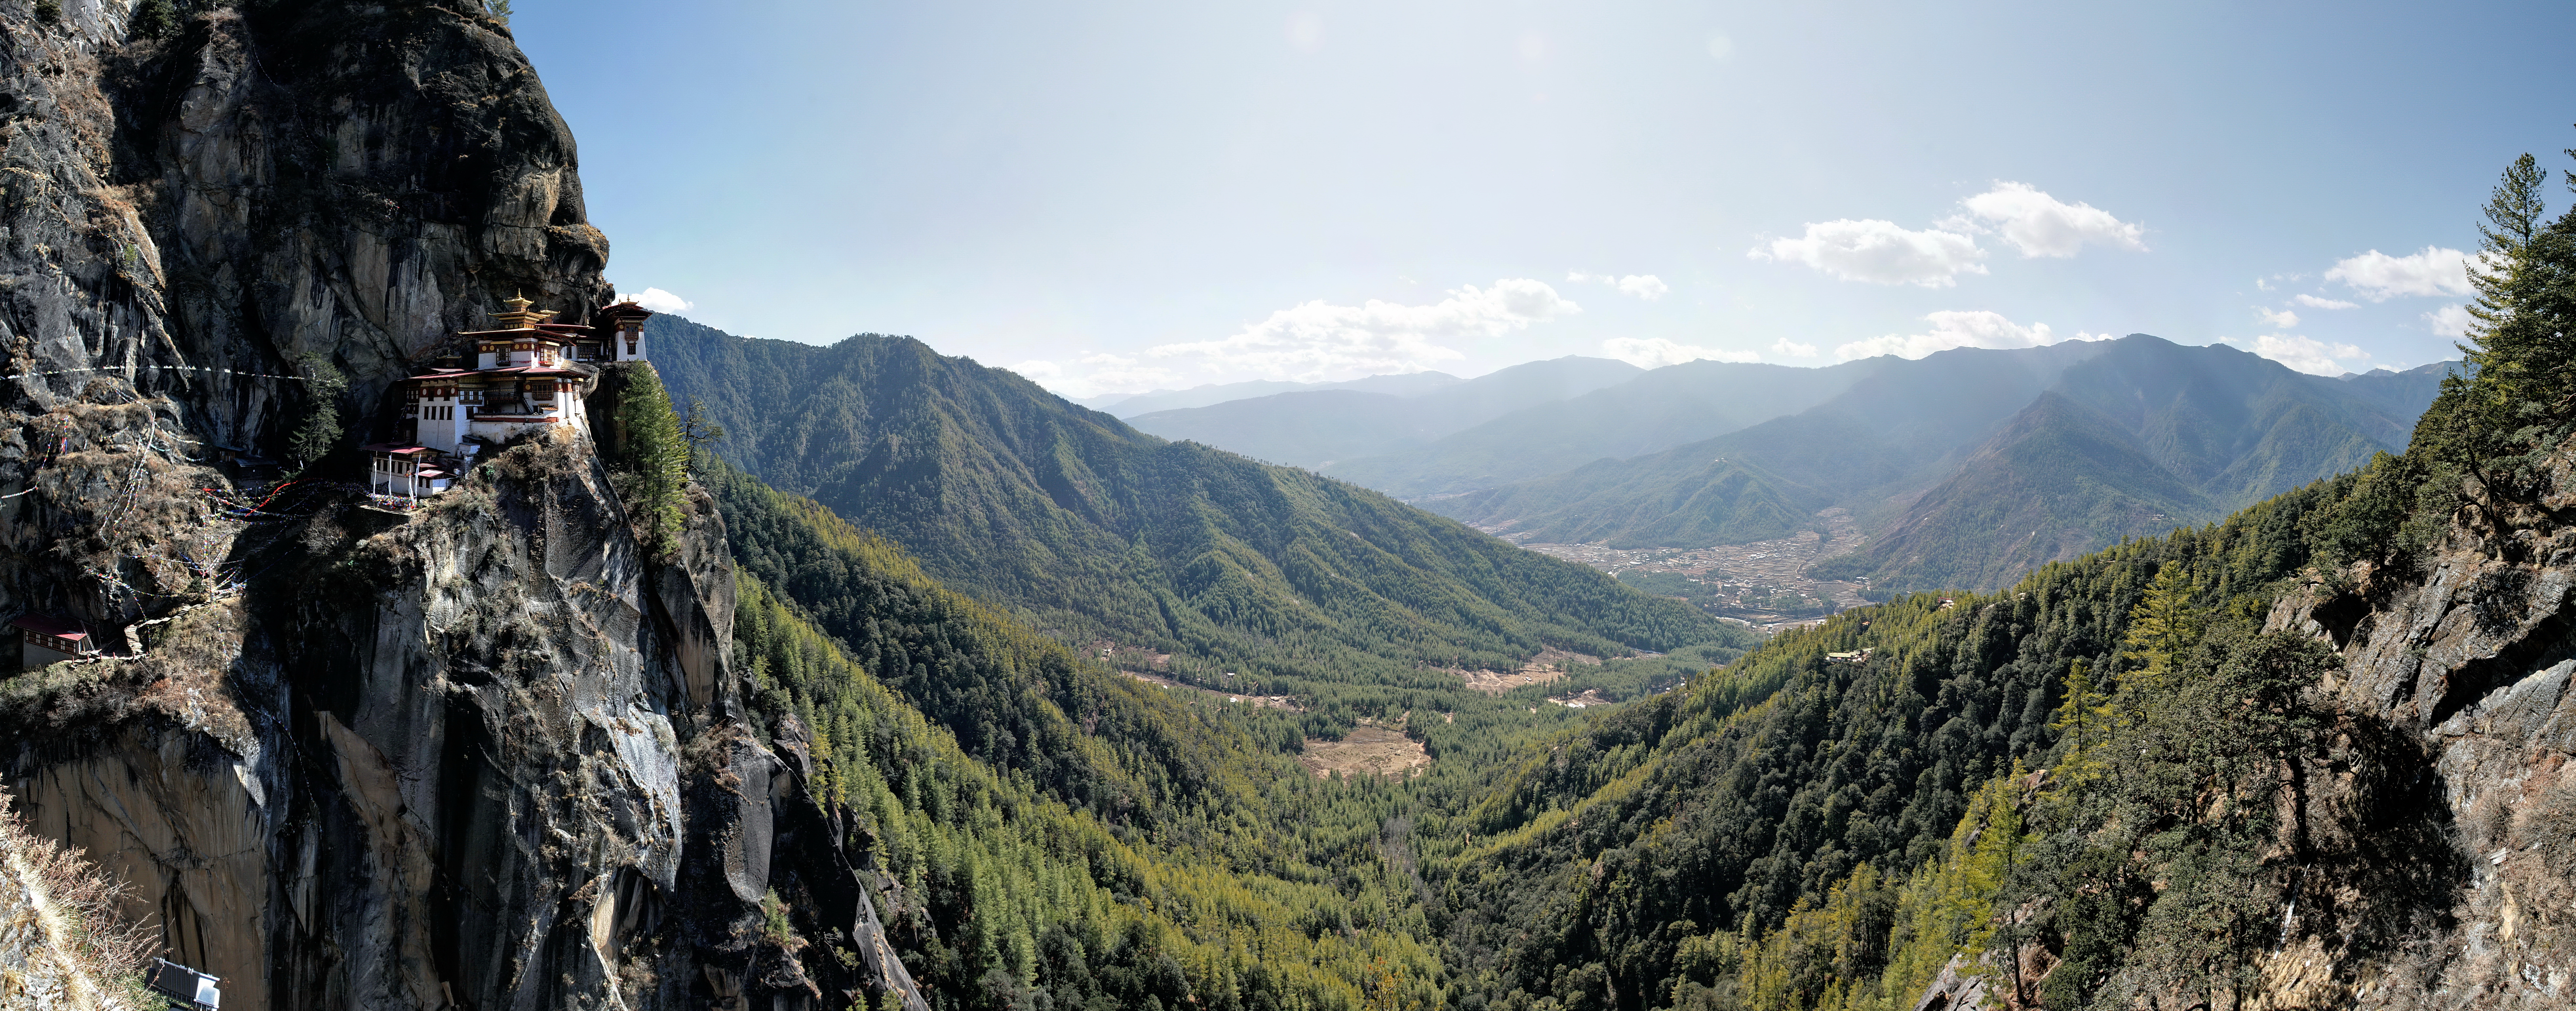 Butan monastery 3 by Melissa-sama